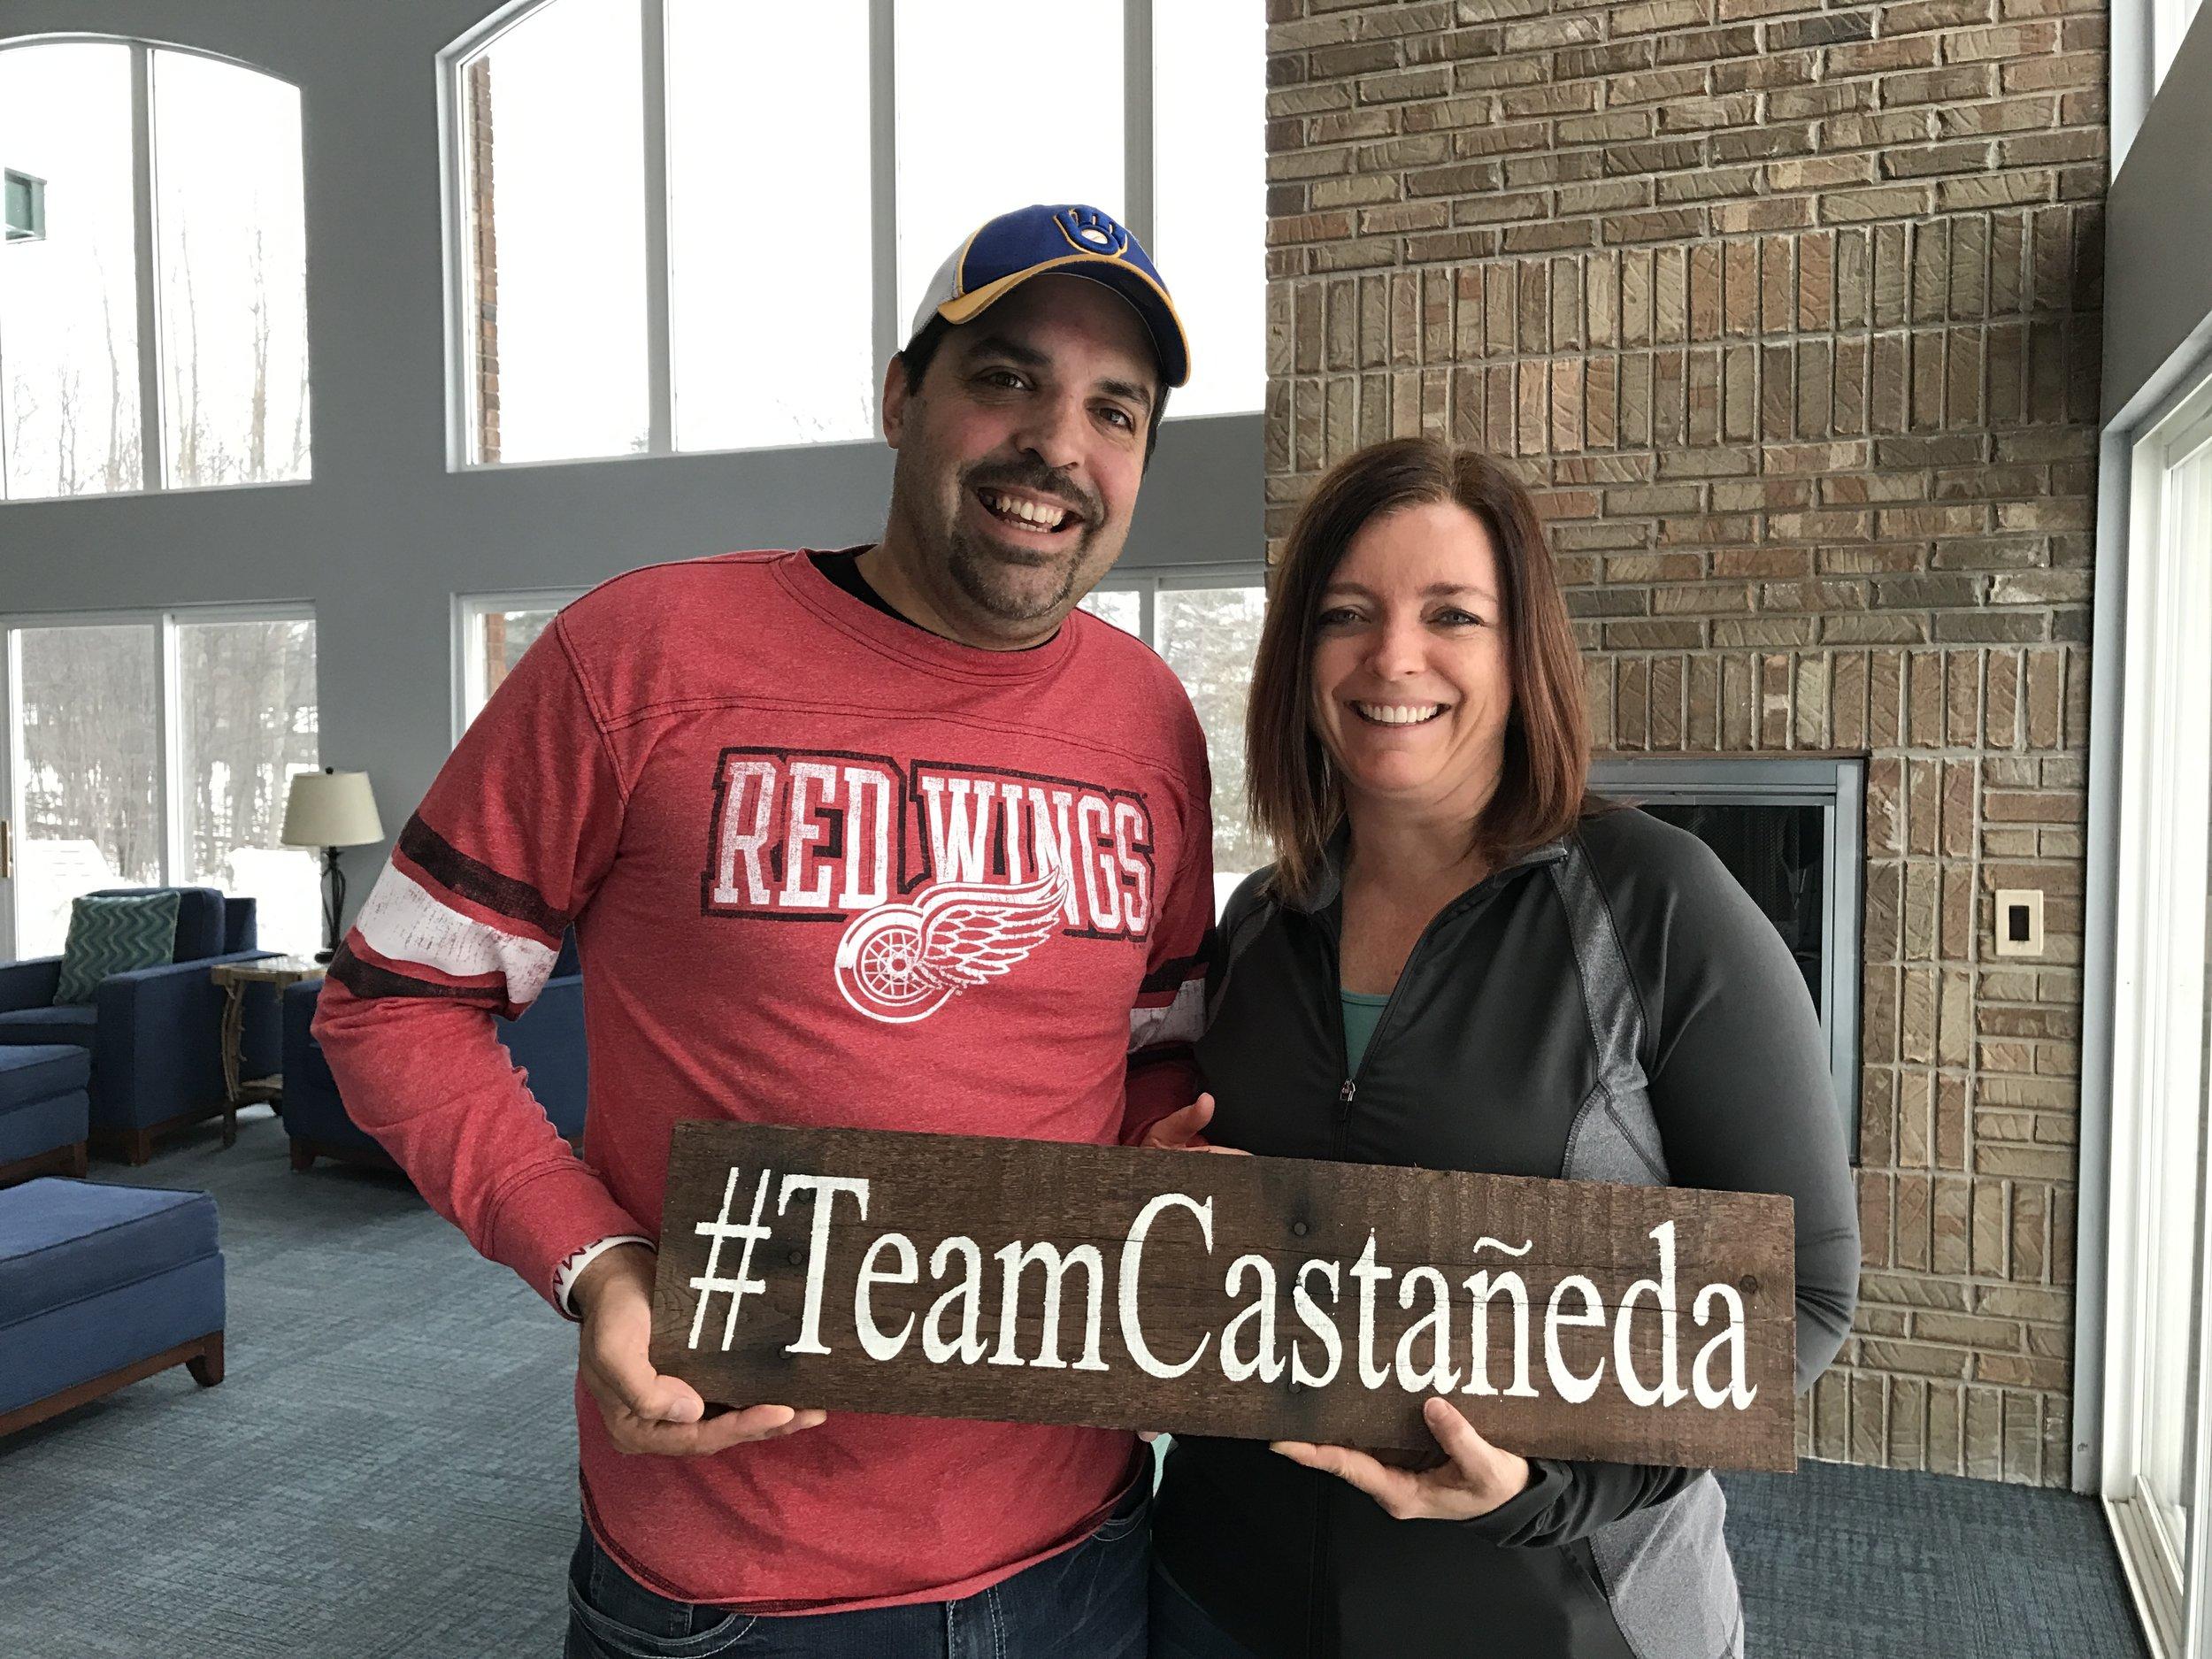 #TeamCastañeda gets stronger when we spend more quality time together!